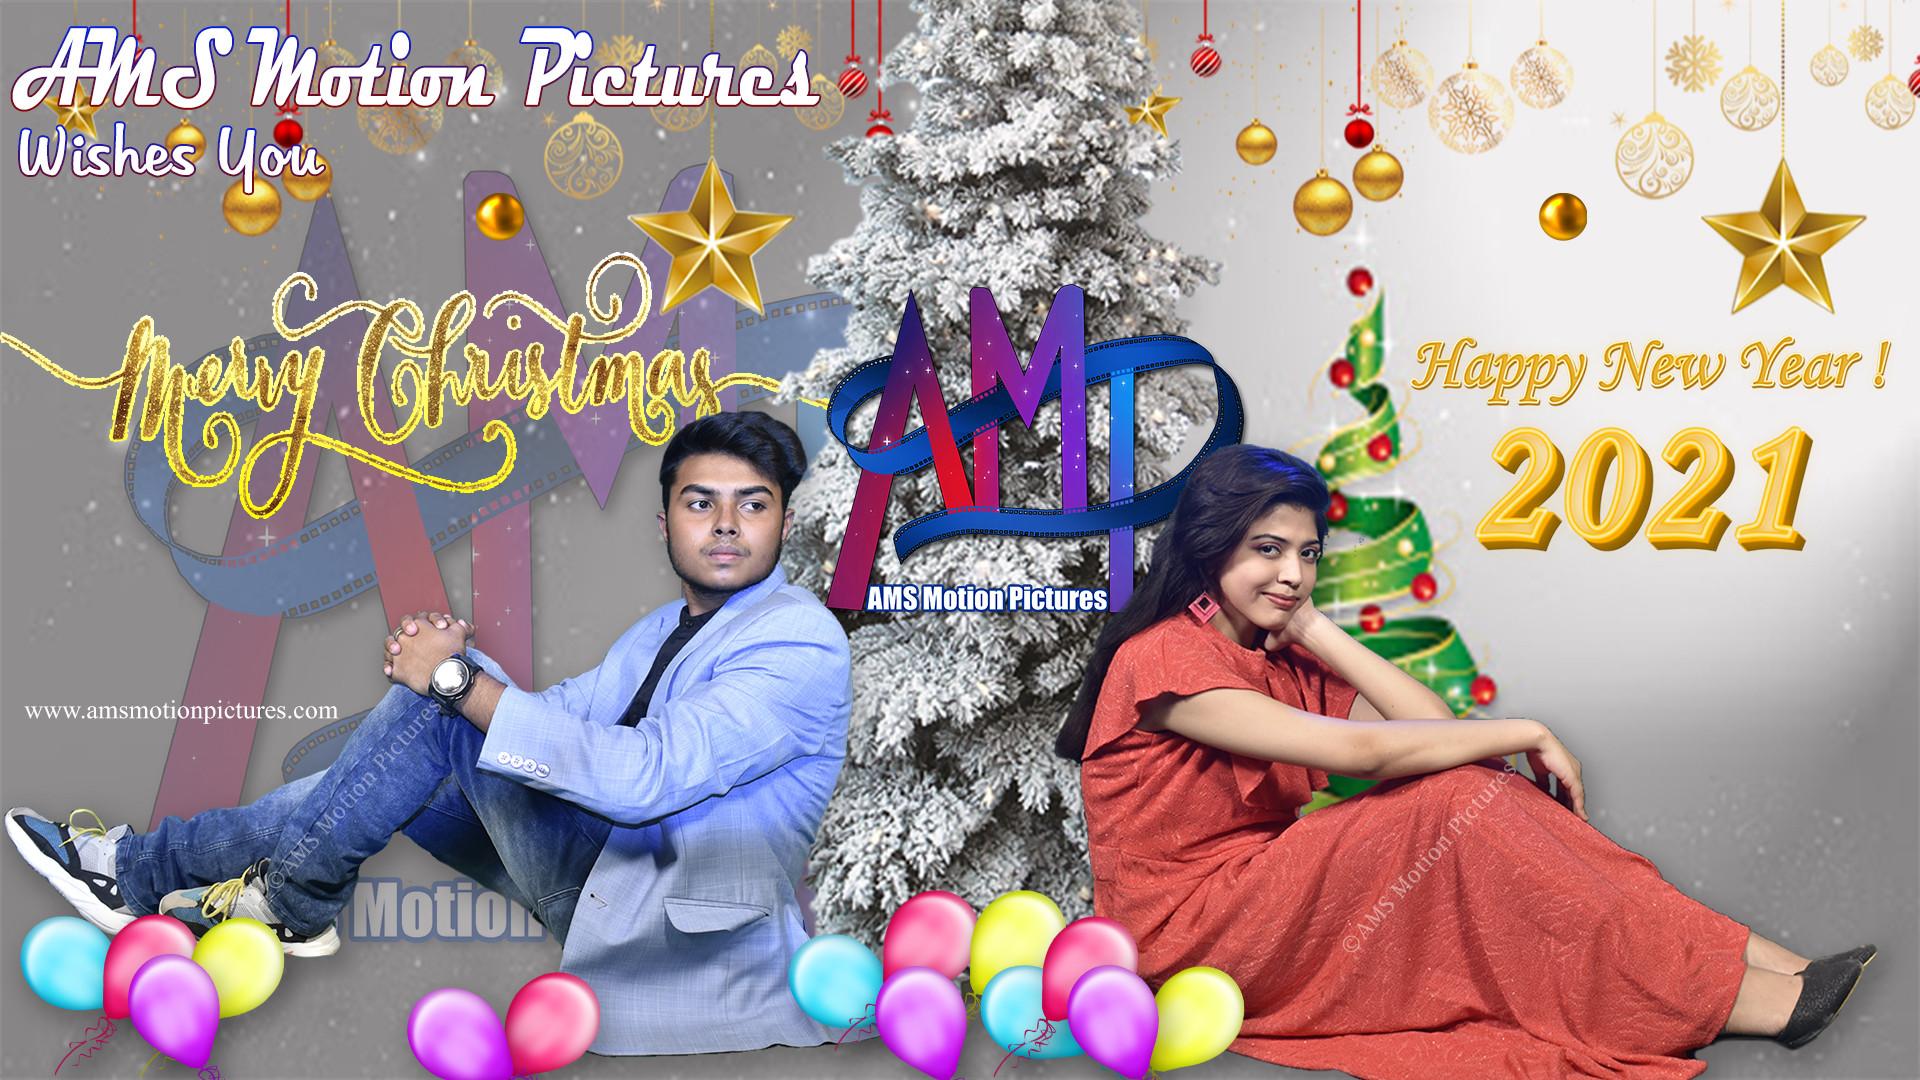 Christmas & New Year Poster 03.jpg